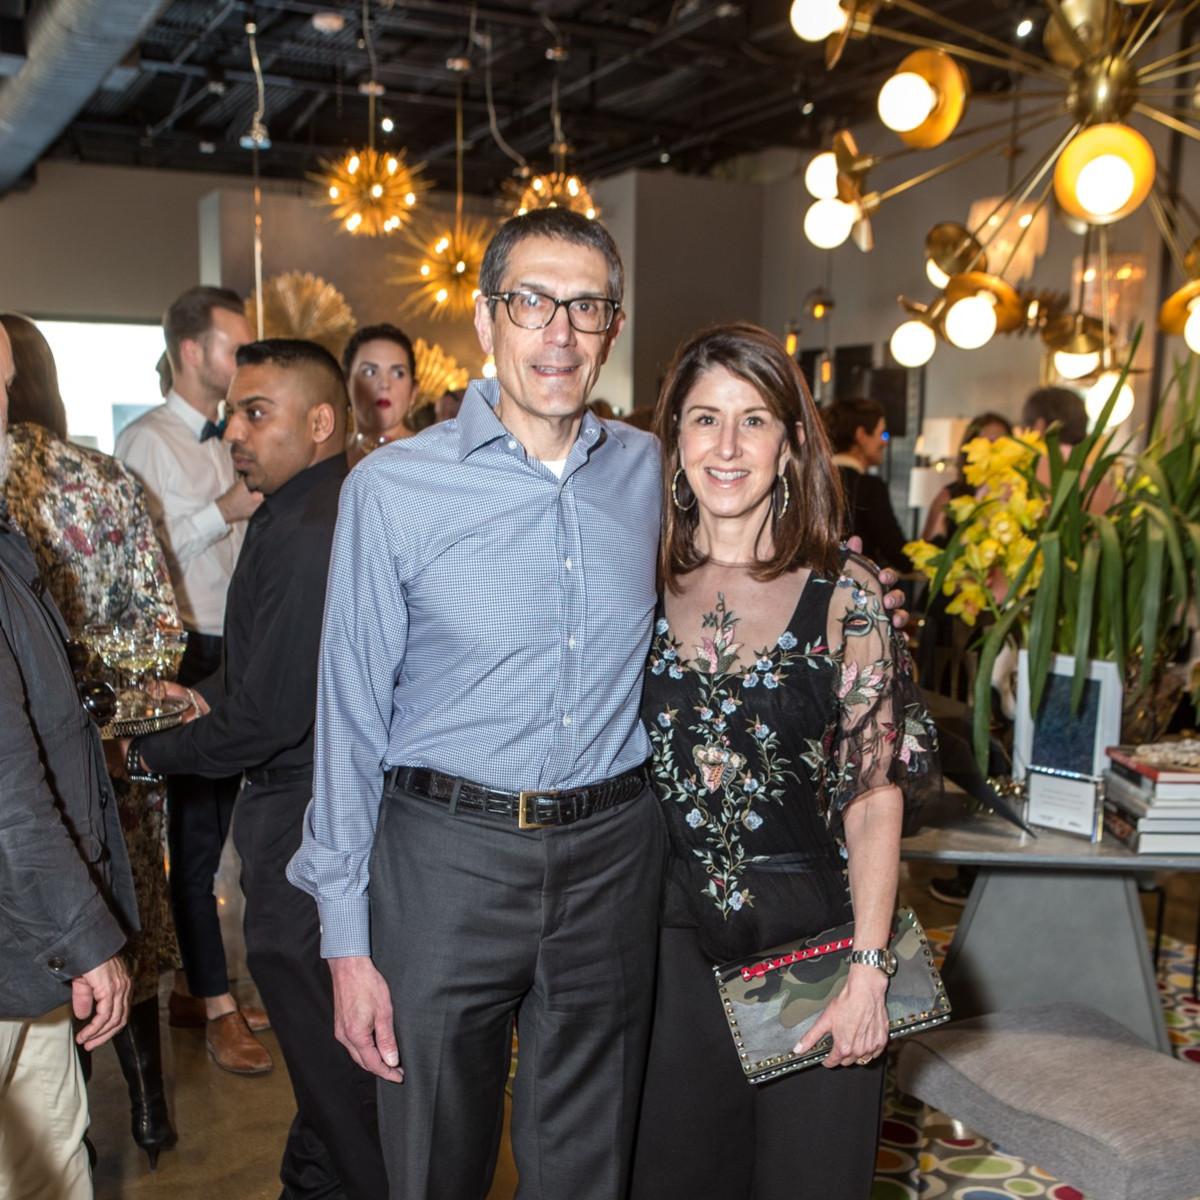 Alan Katz; Karen Katz, Arteriors Party 2018